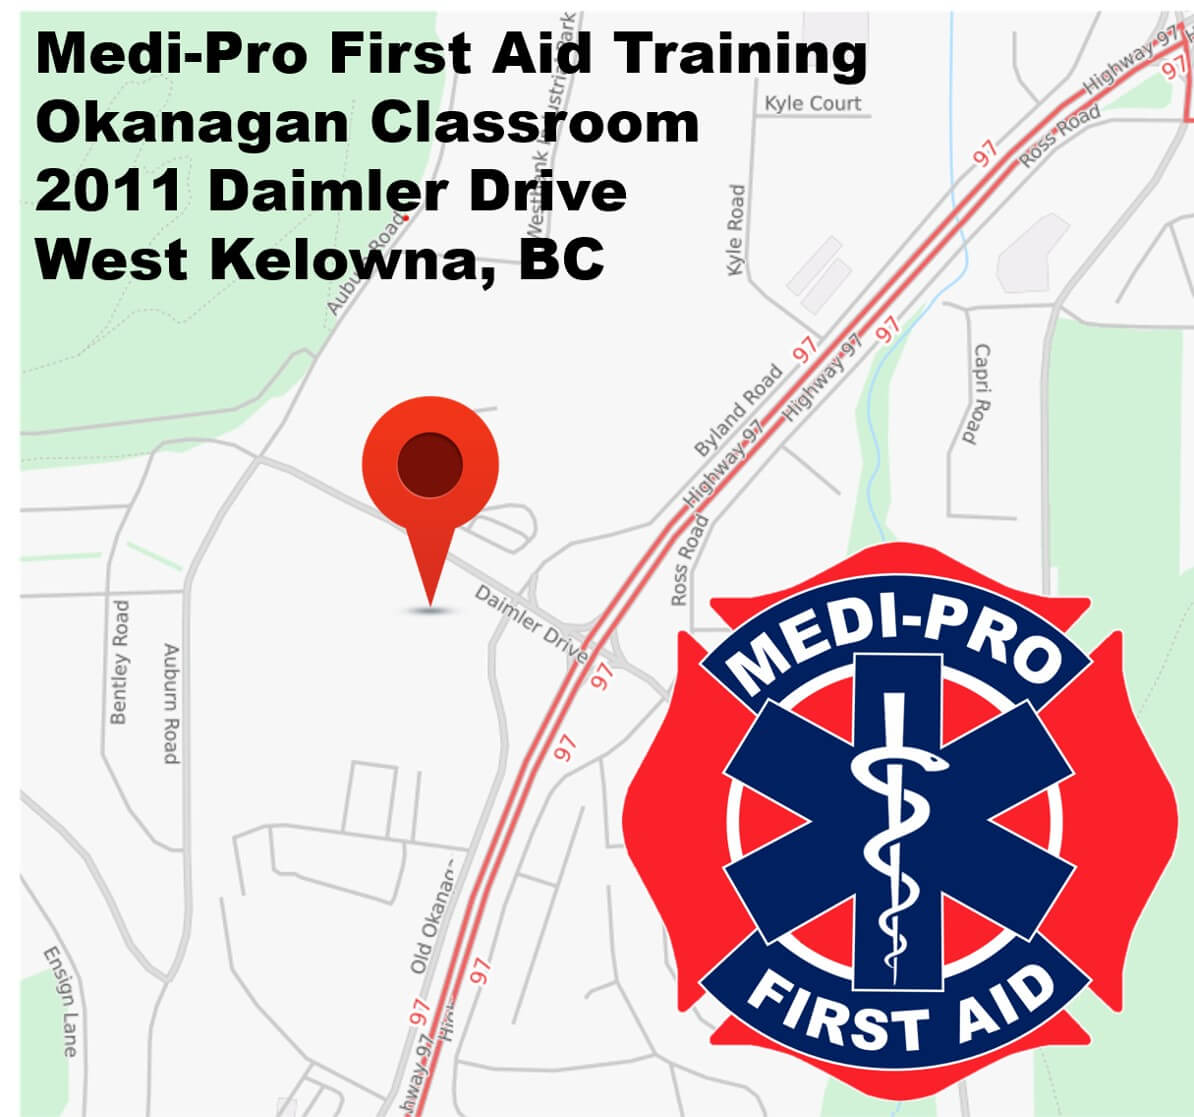 Map Of Canada Showing Kelowna.Kelowna Standard First Aid Courses Kelowna First Aid Cpr Courses